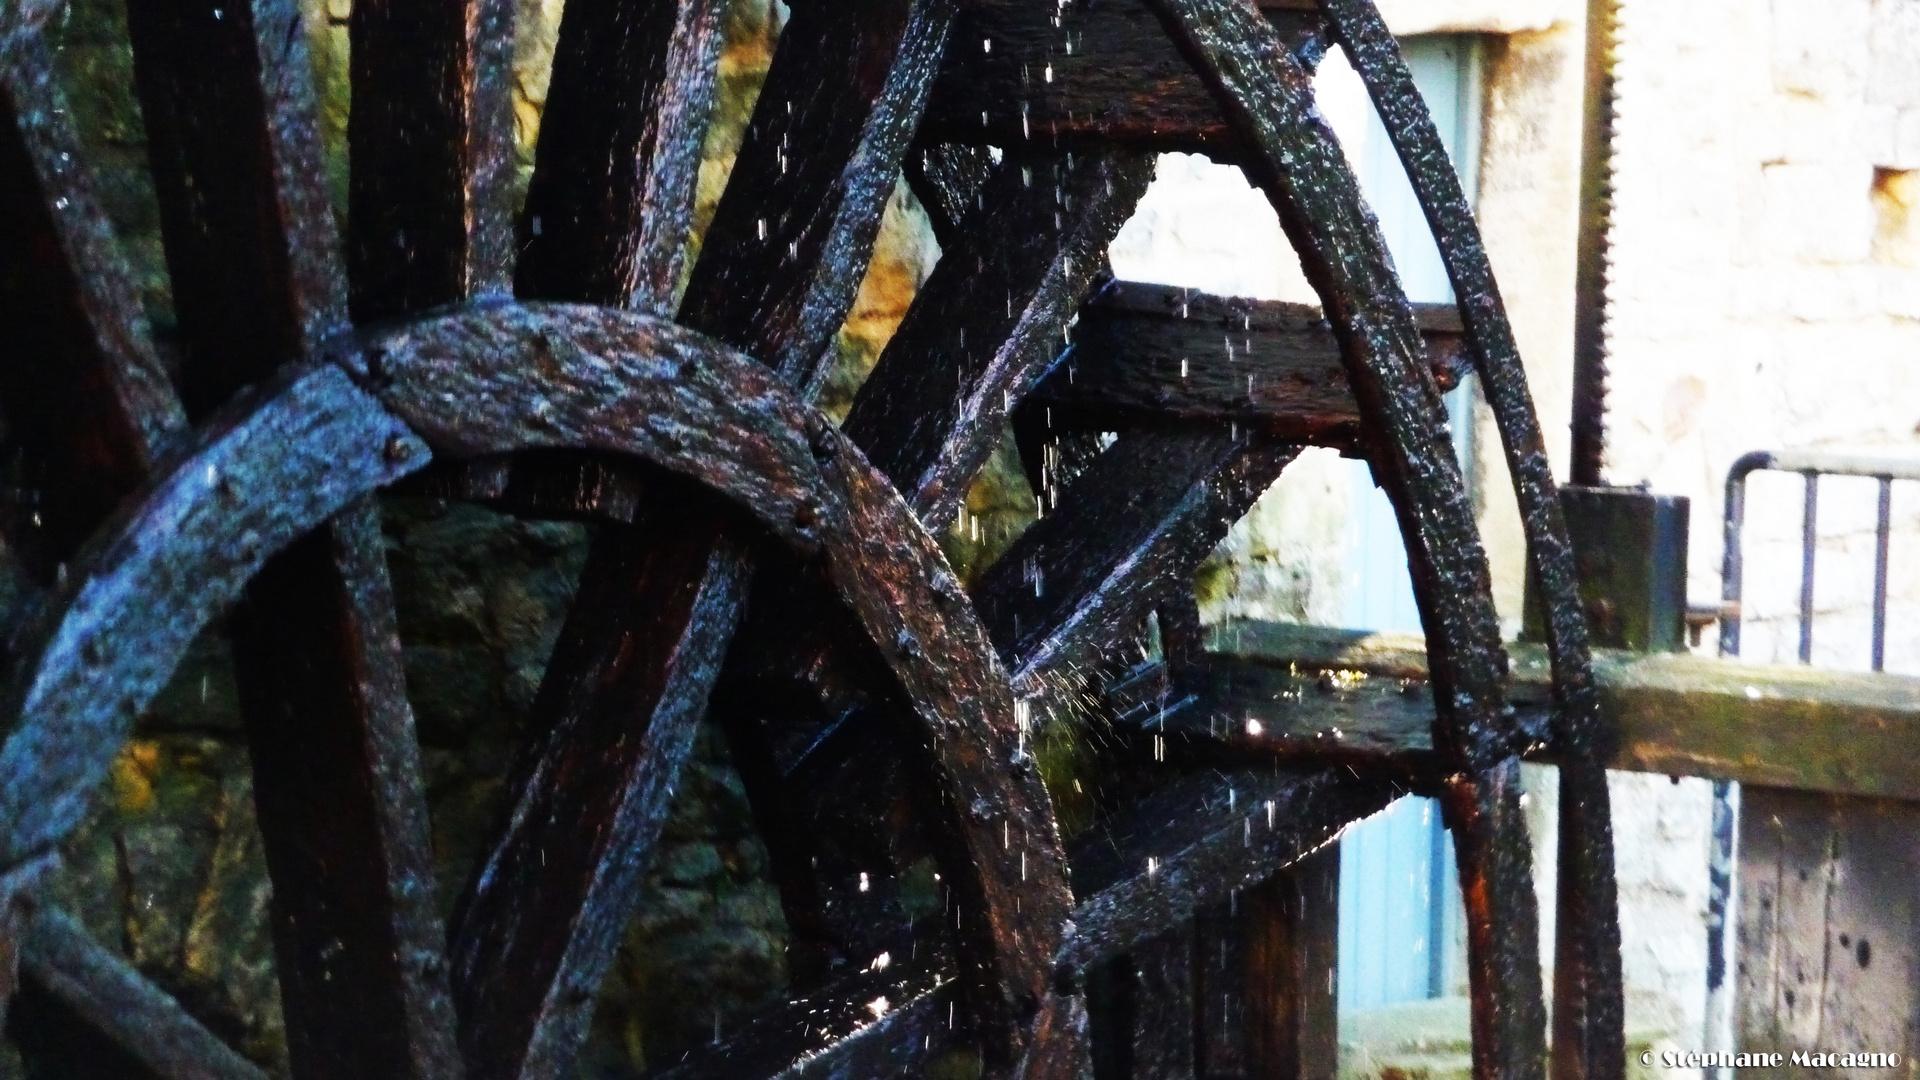 Le roue transpire